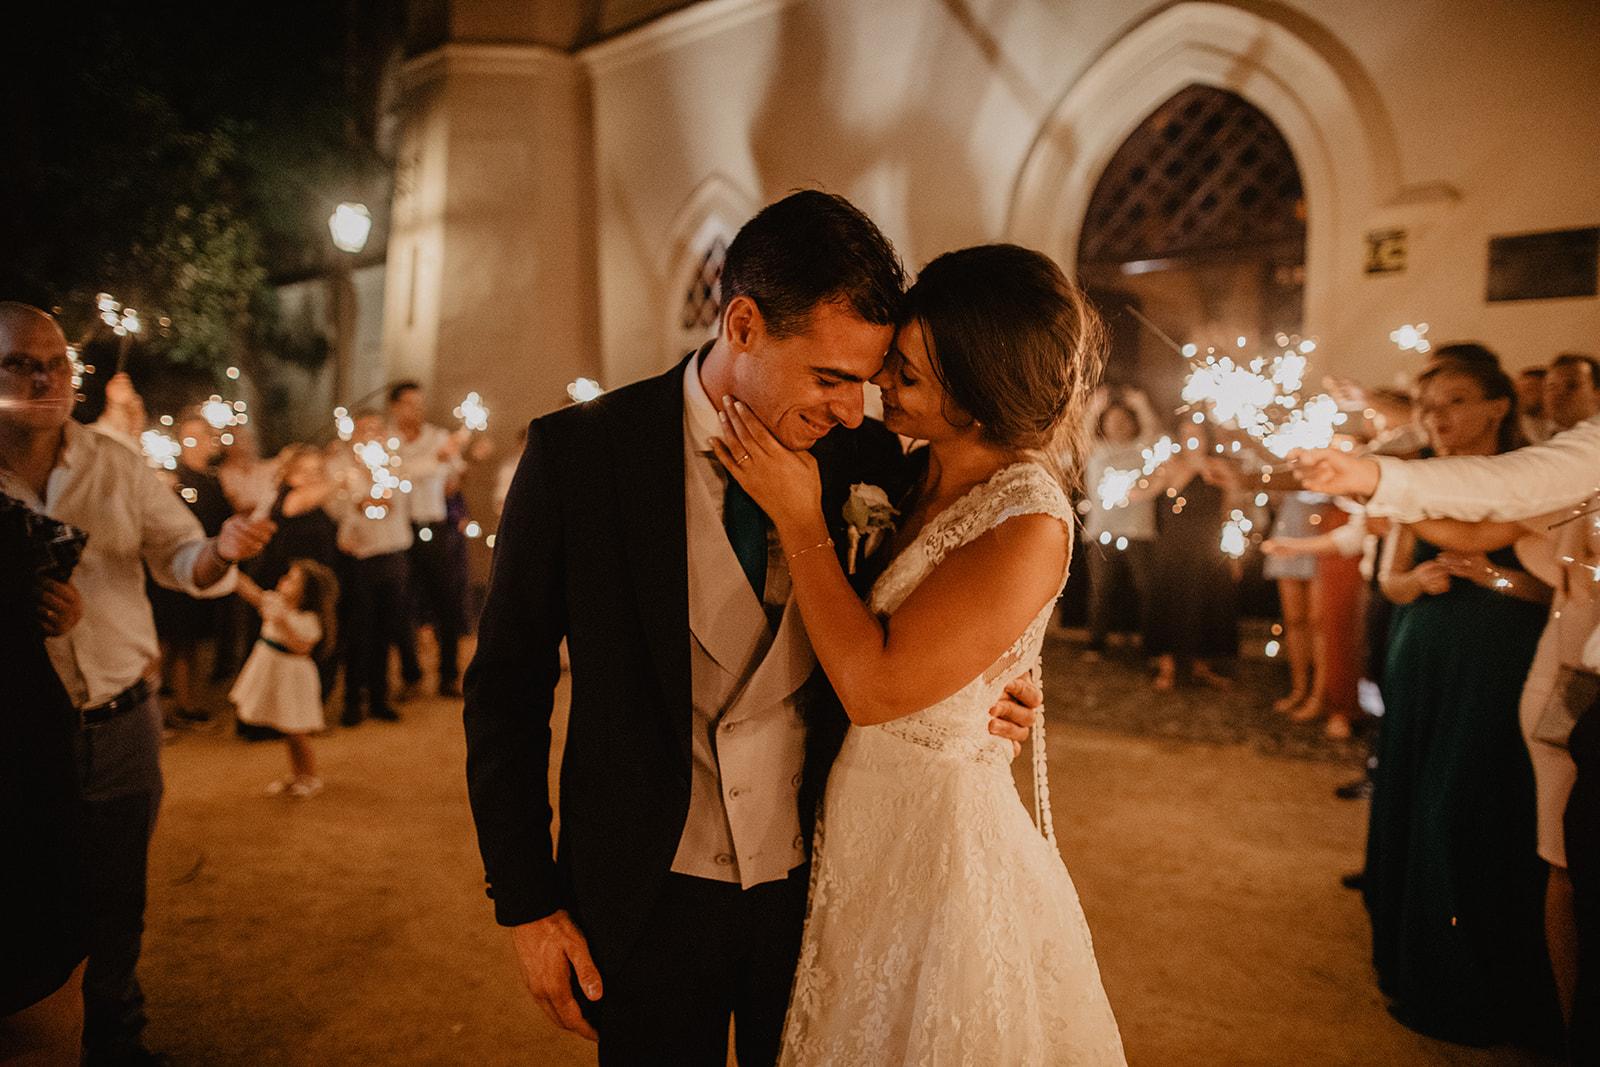 Lapela-photography-wedding-algarve-portugal-best-of-139.jpg